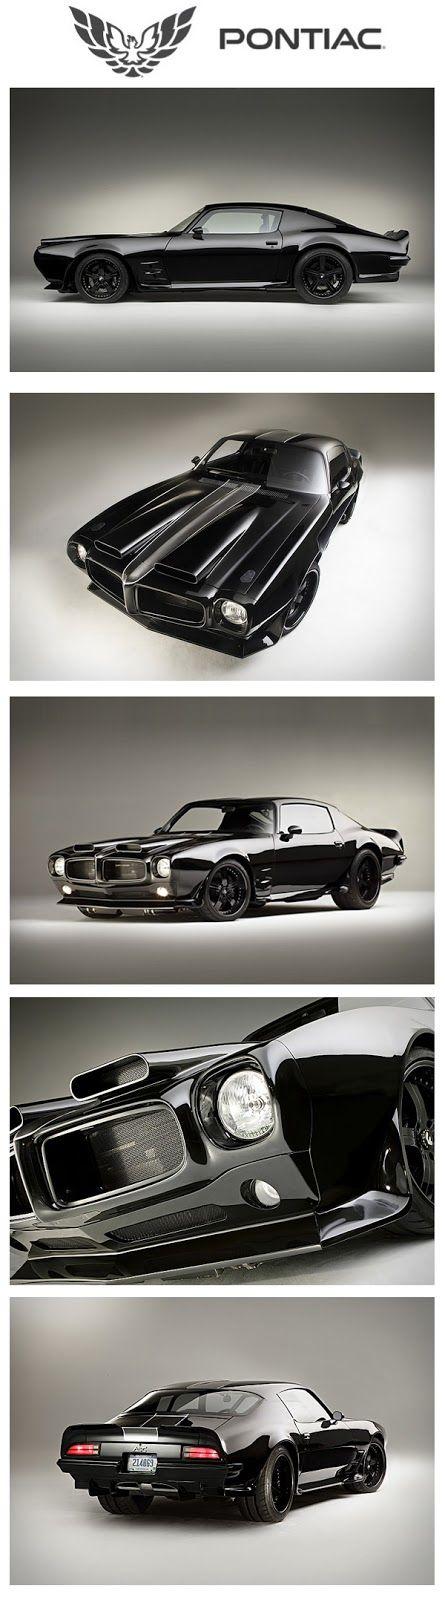 '70 #Pontiac Firebird